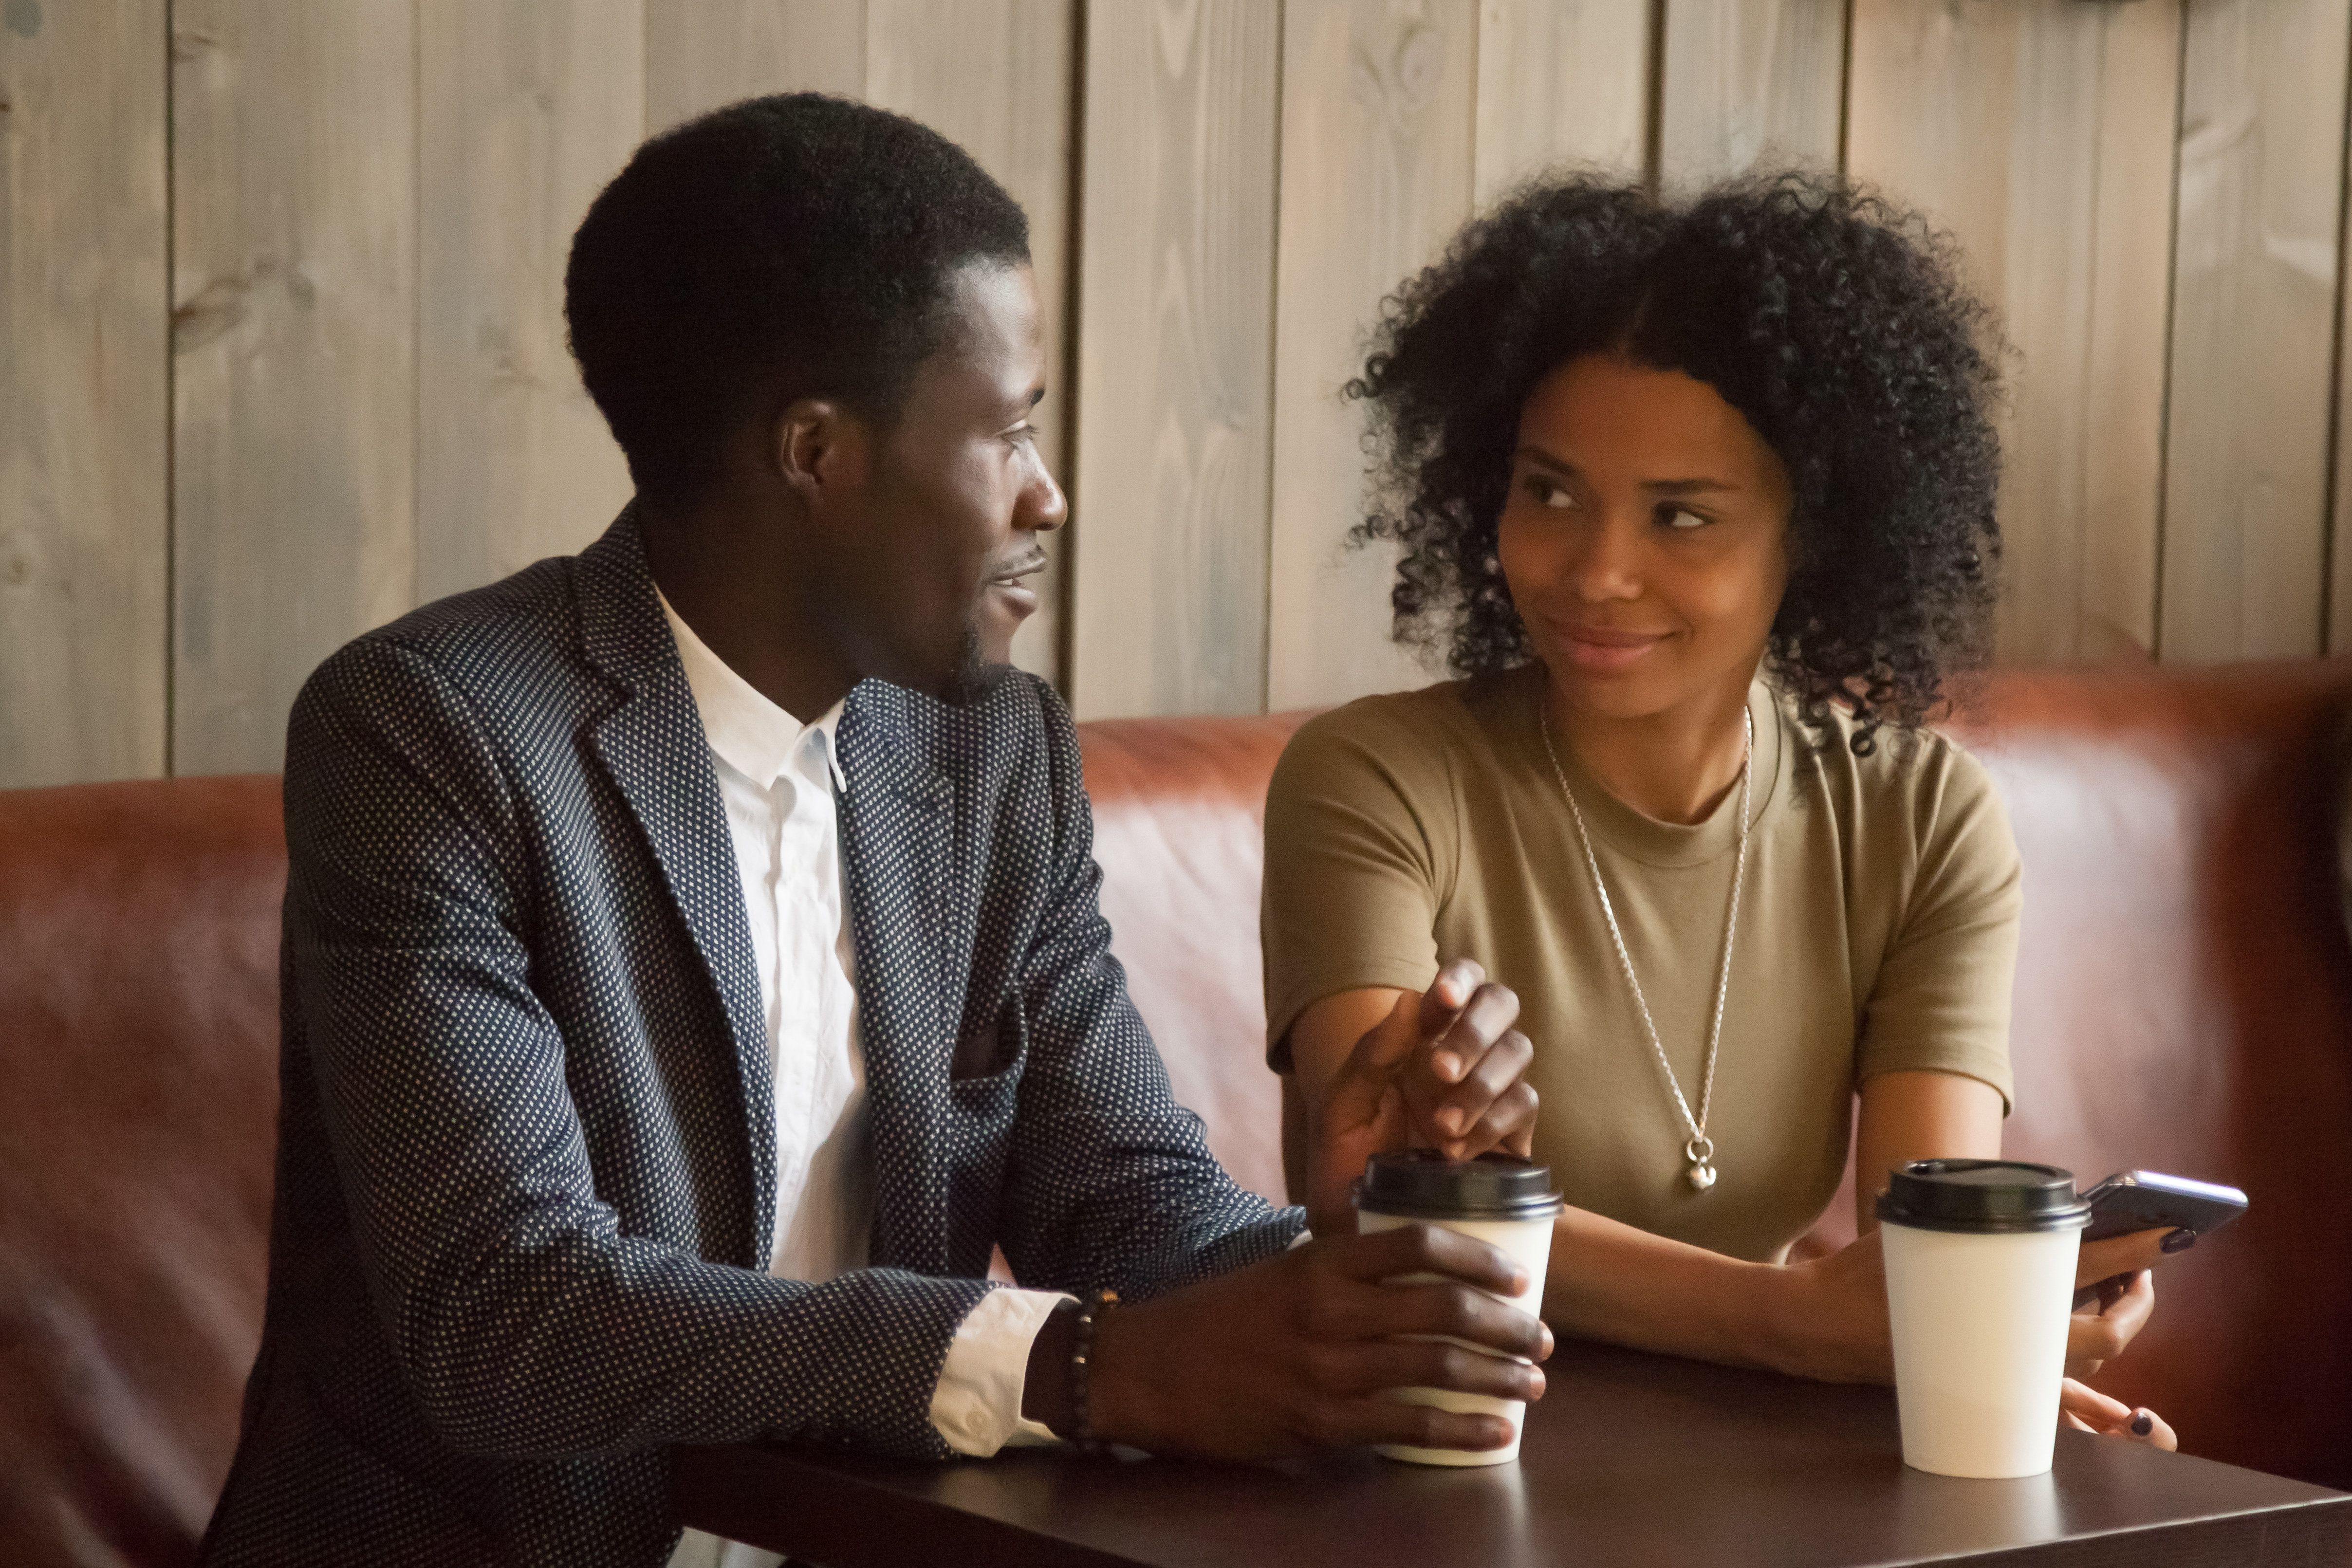 Third date conversation topics